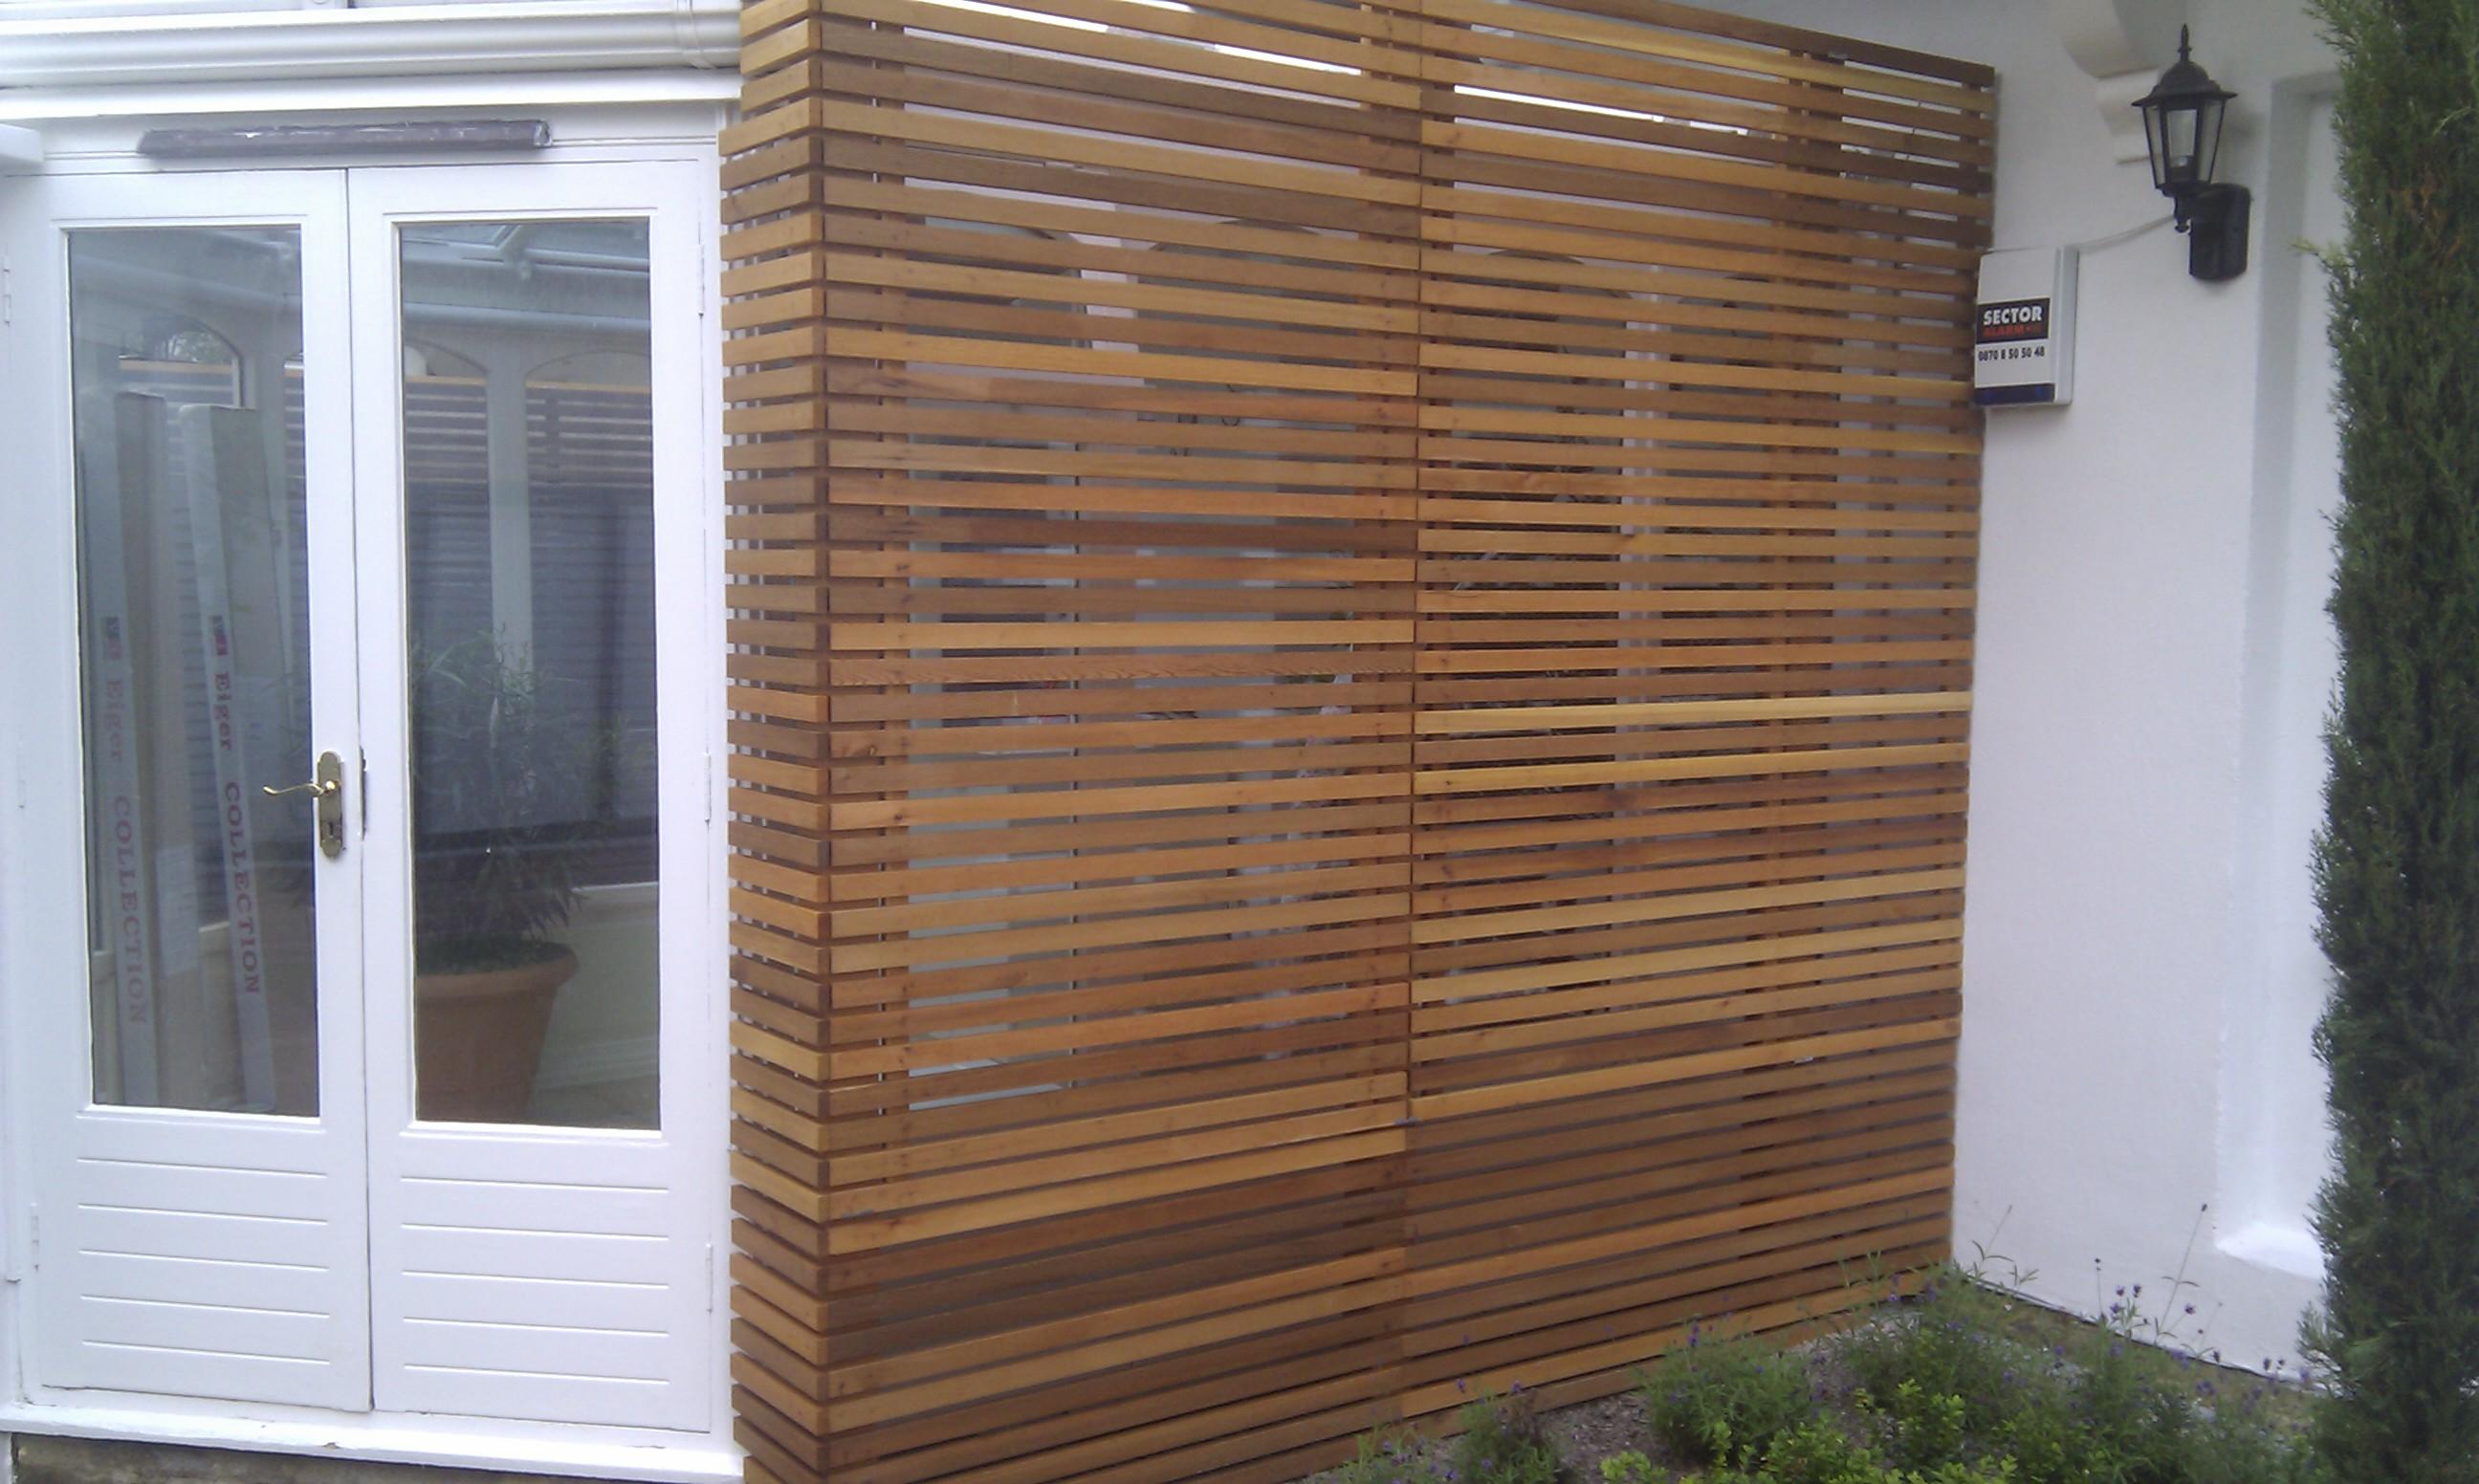 modern garden design london slatted grey privacy screen sandstone paving easy grass balau hardwood decking (21)